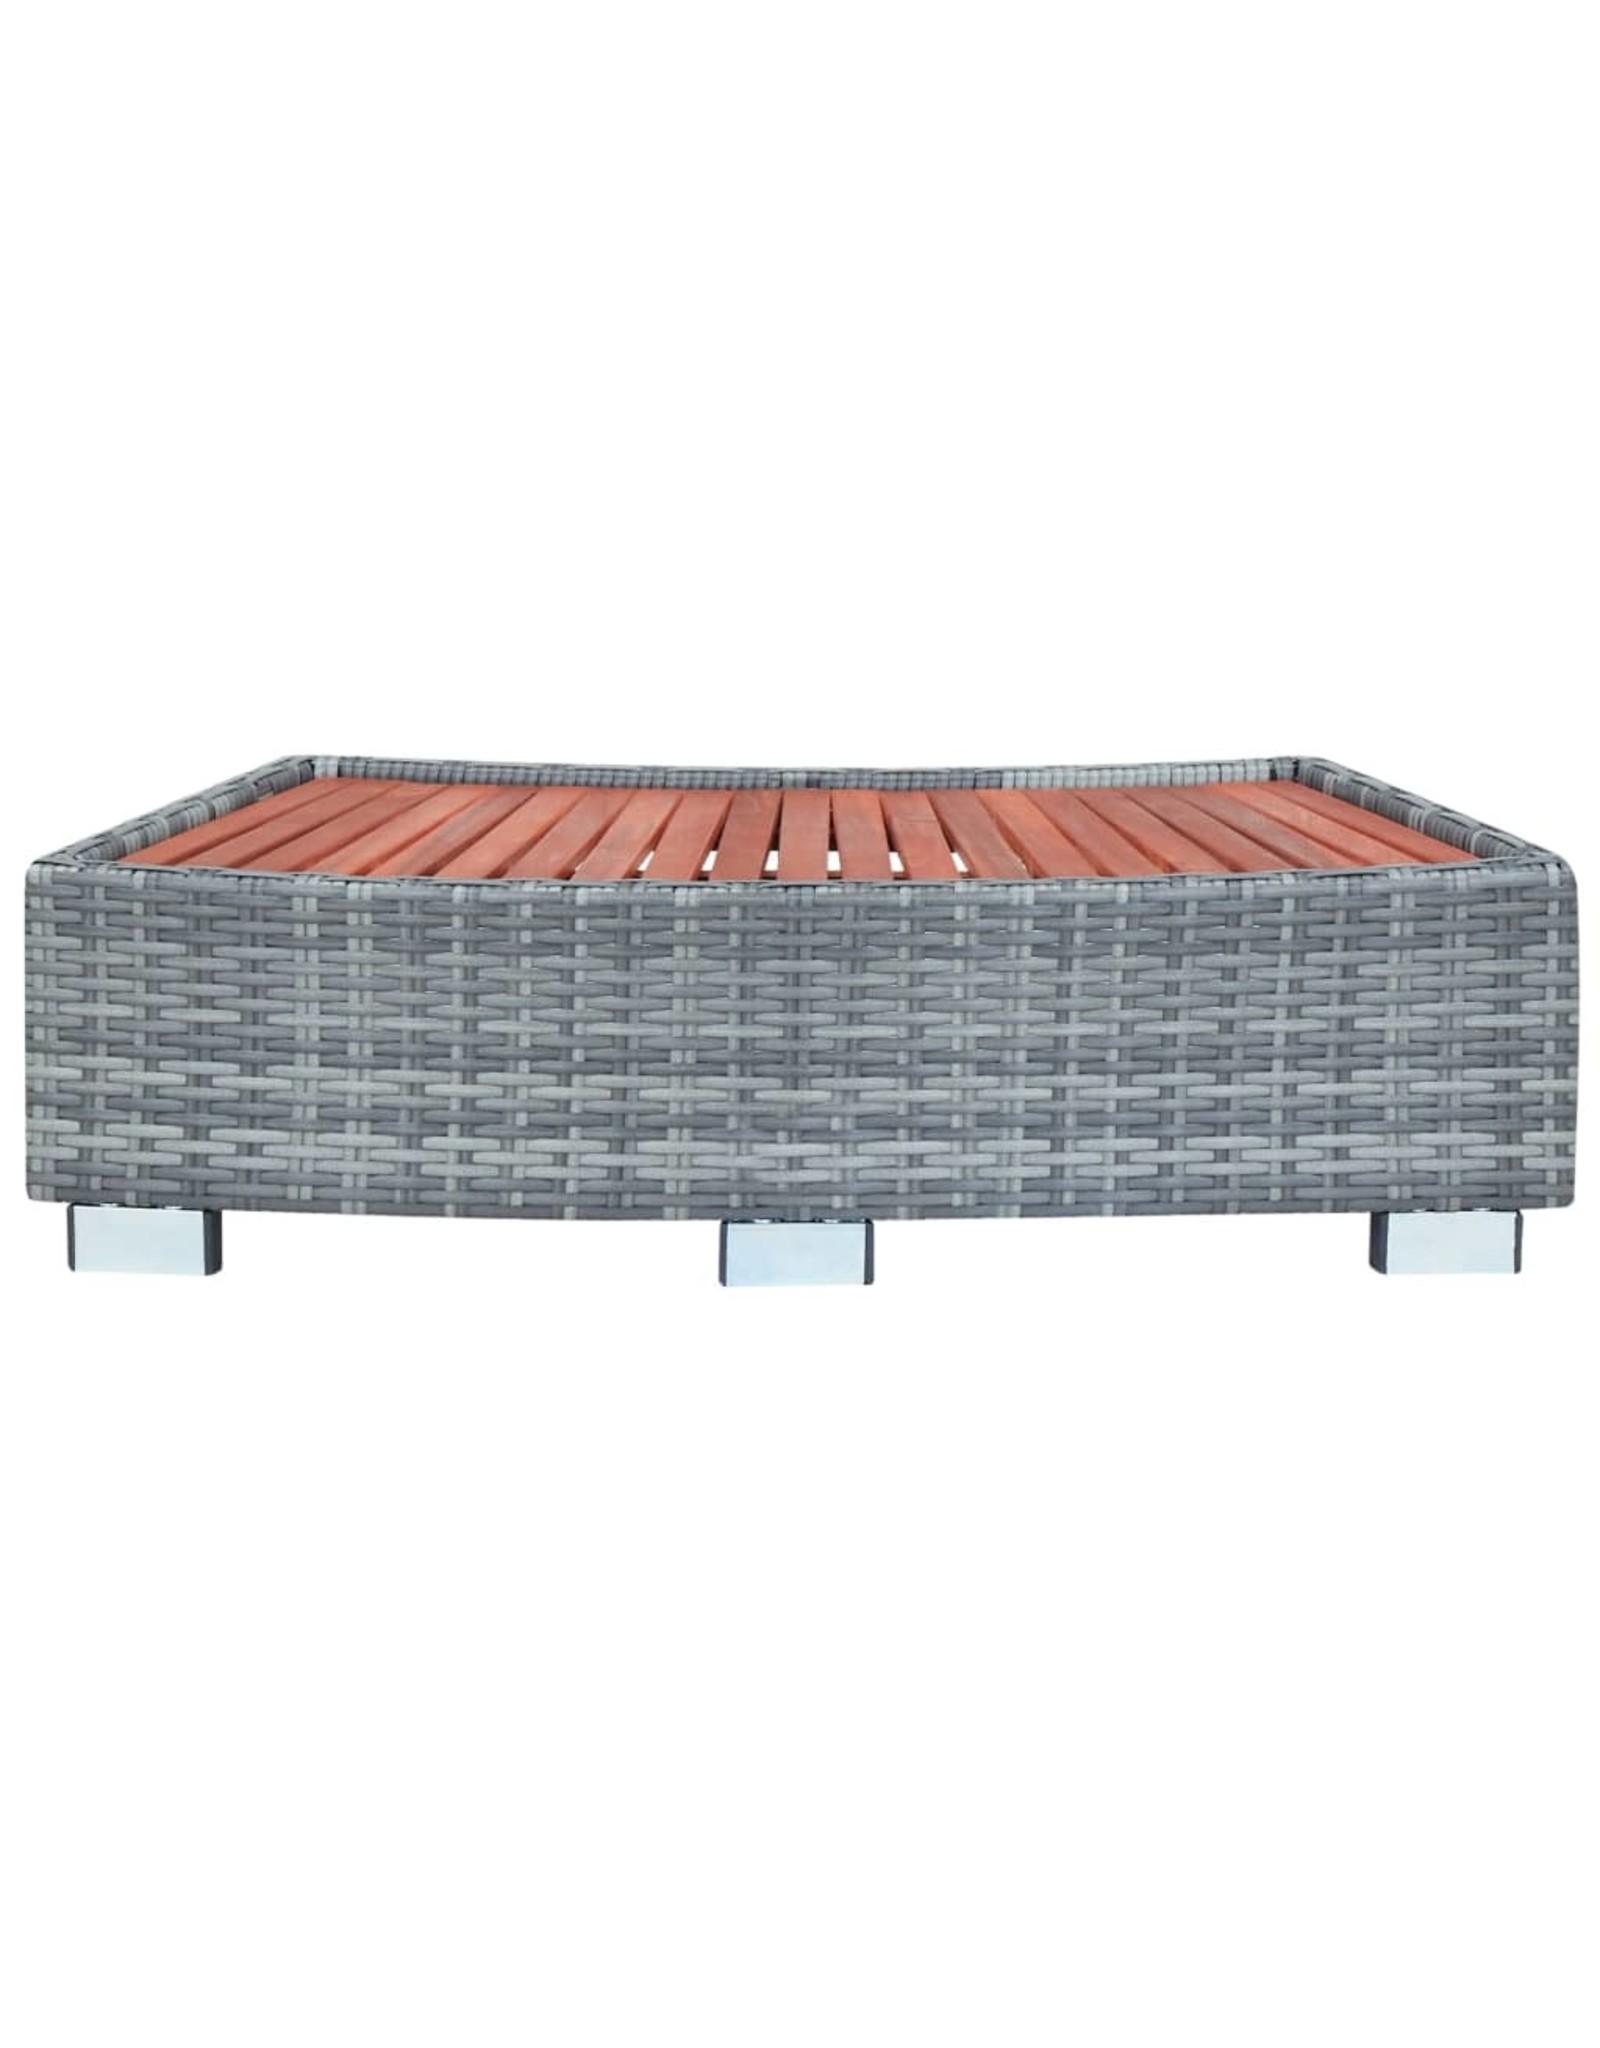 Spa trapje 92x45x25 cm poly rattan grijs